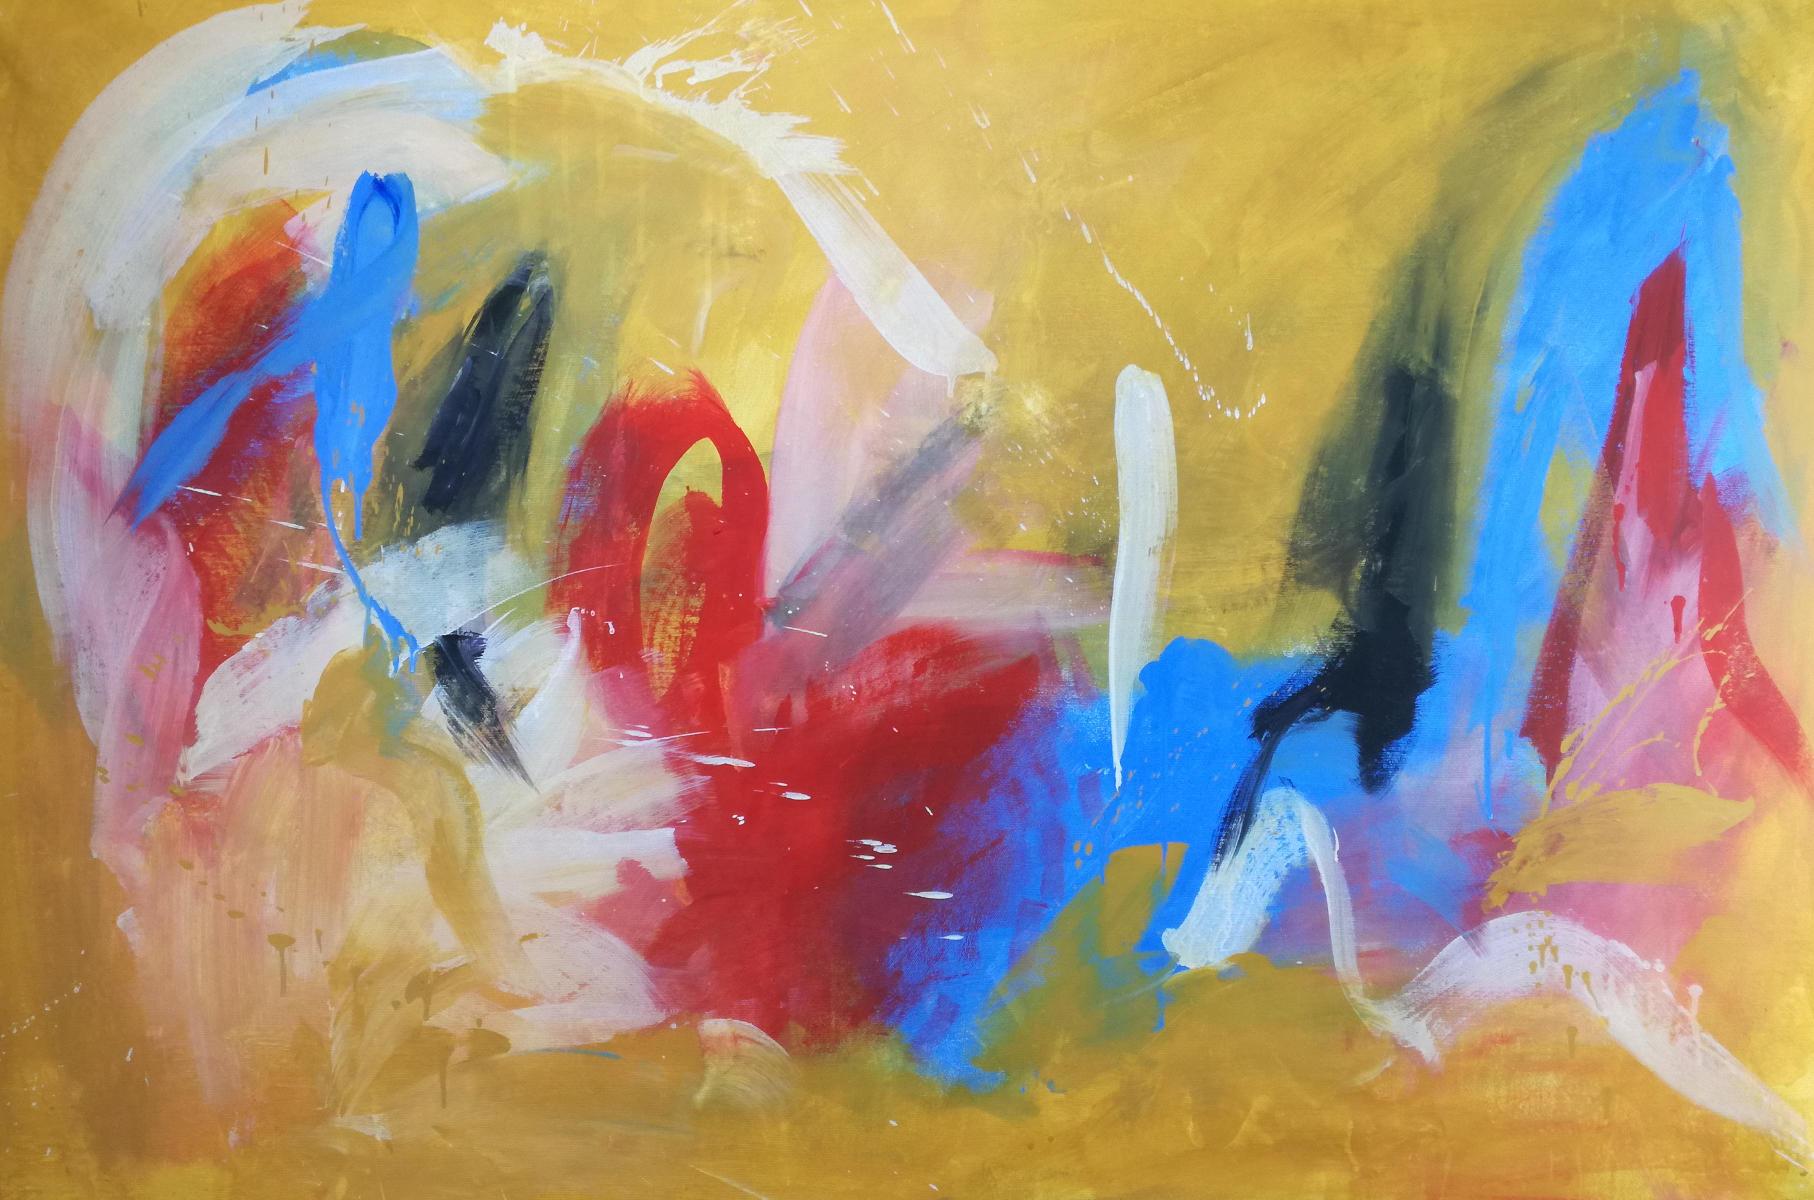 quadri astratti su tela c117 - dipinto giallo dipinto a mano 120x80